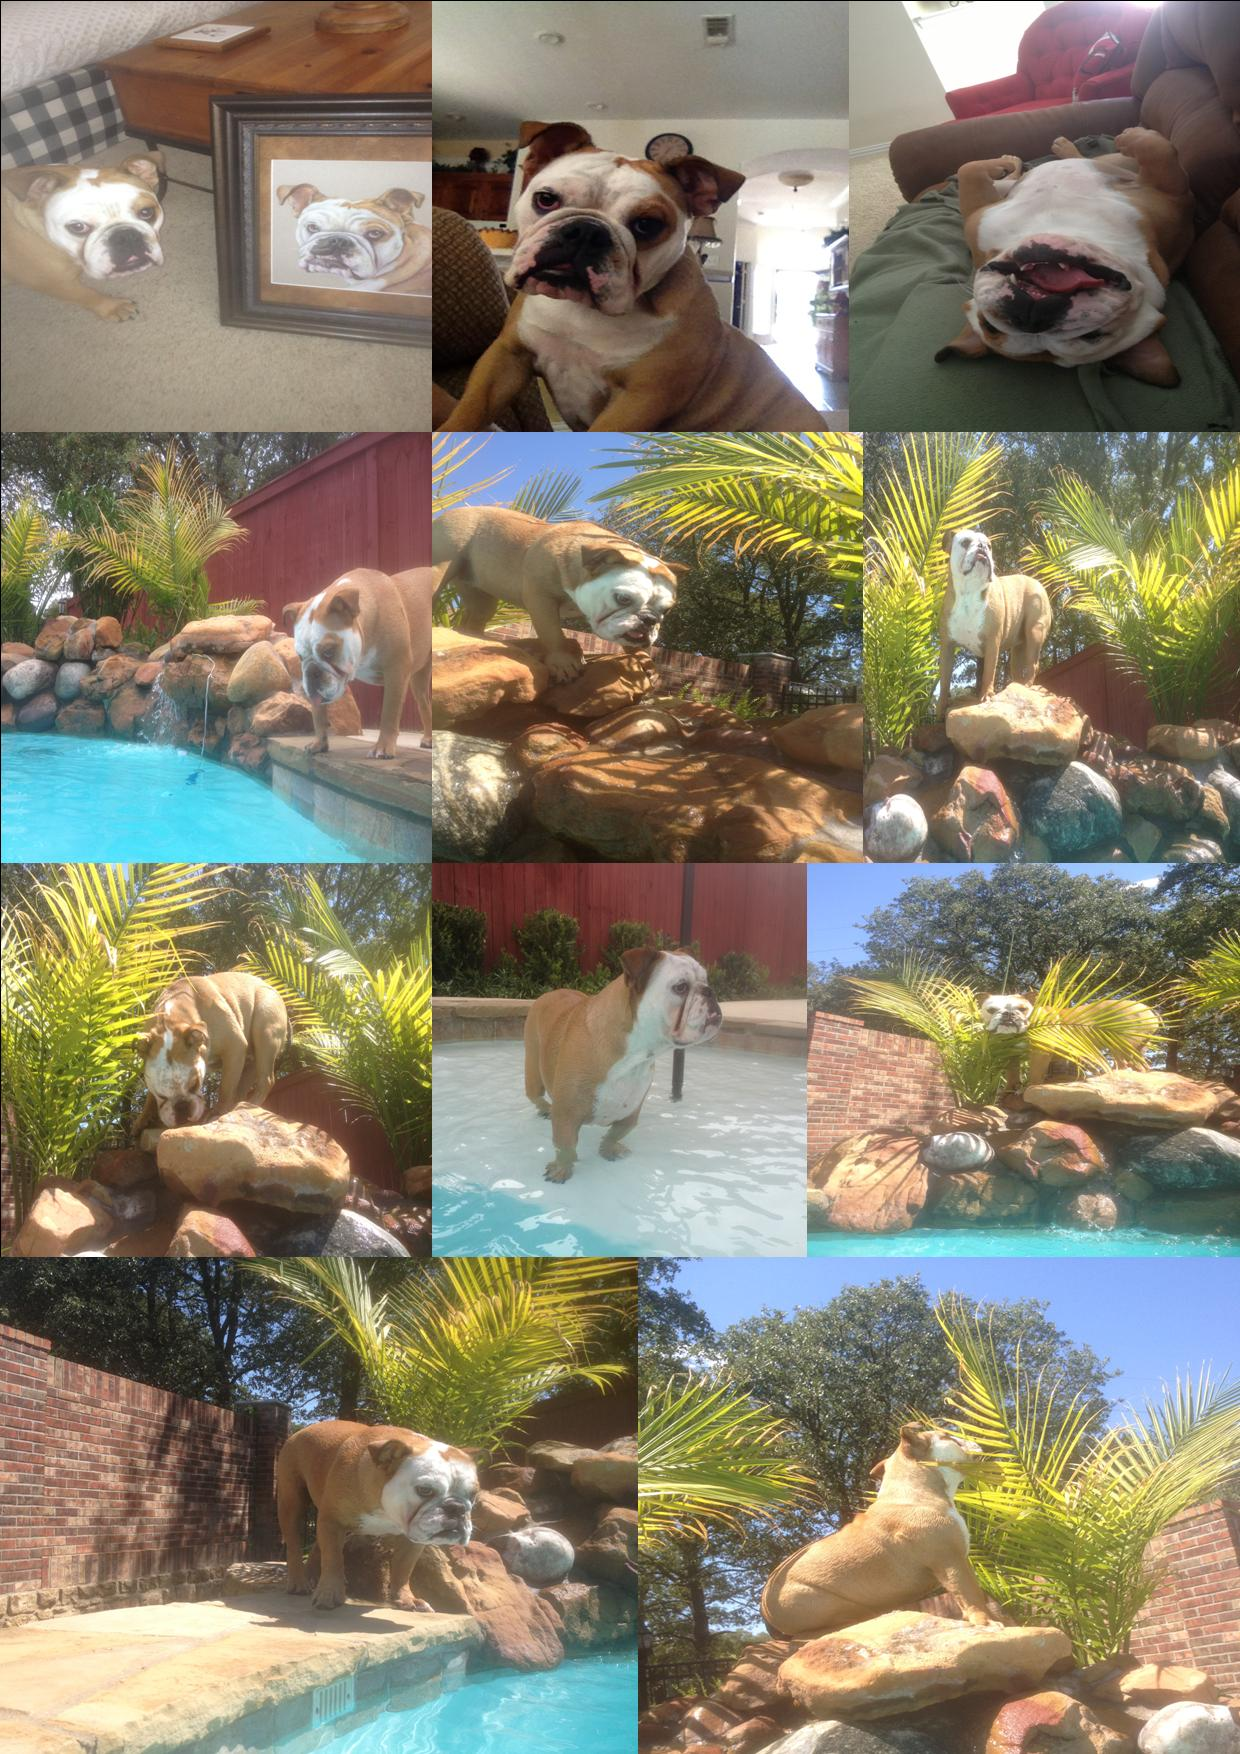 Ellie the Wonder Dog